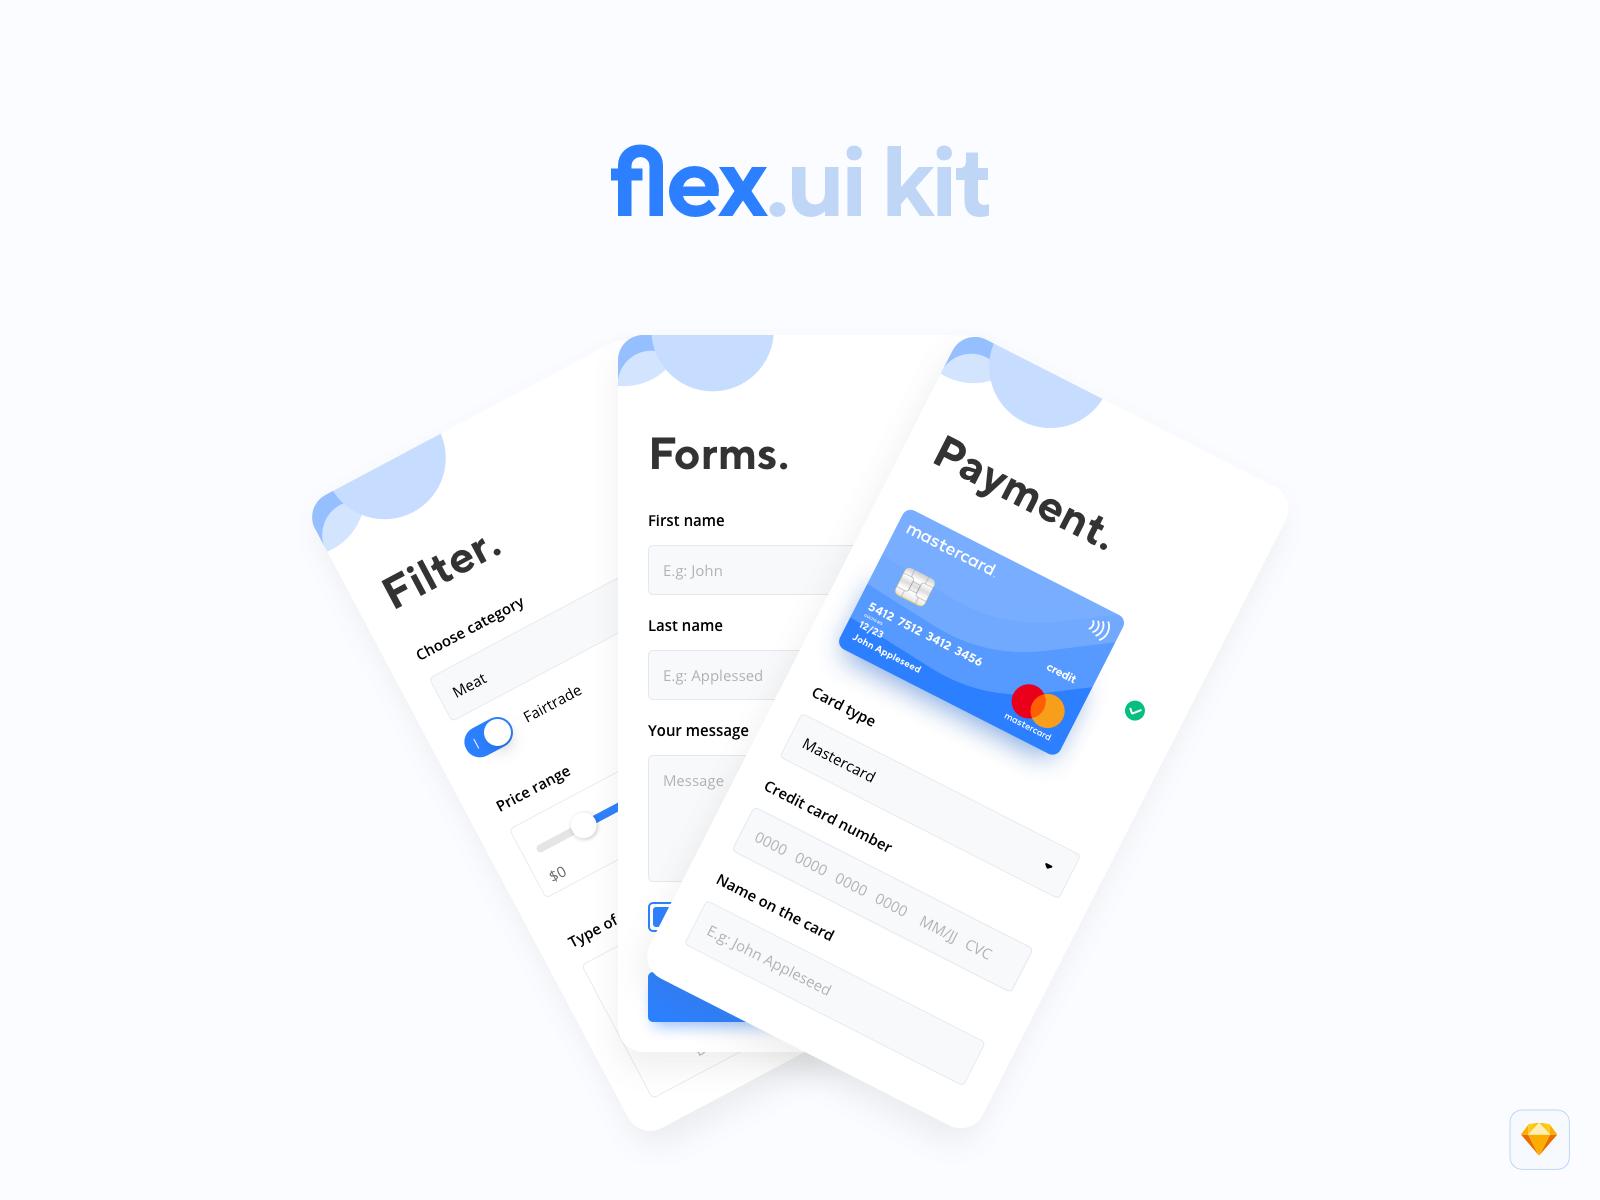 flex.ui kit (v.1.0) – Mobile UI Kit for your purpose cover image